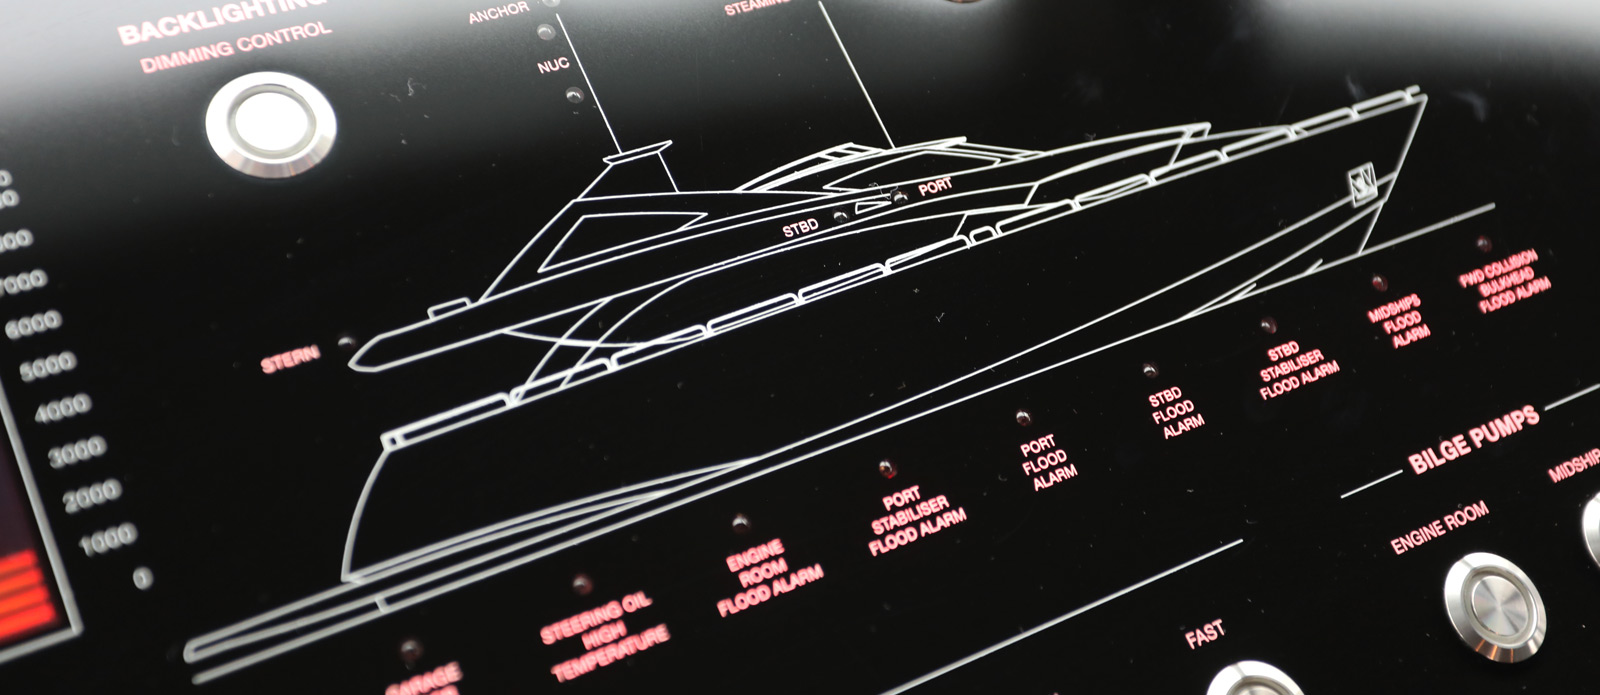 Sunseeker-30-Metre-Yacht-Coraysa-Wheelhouse-Control-Panel